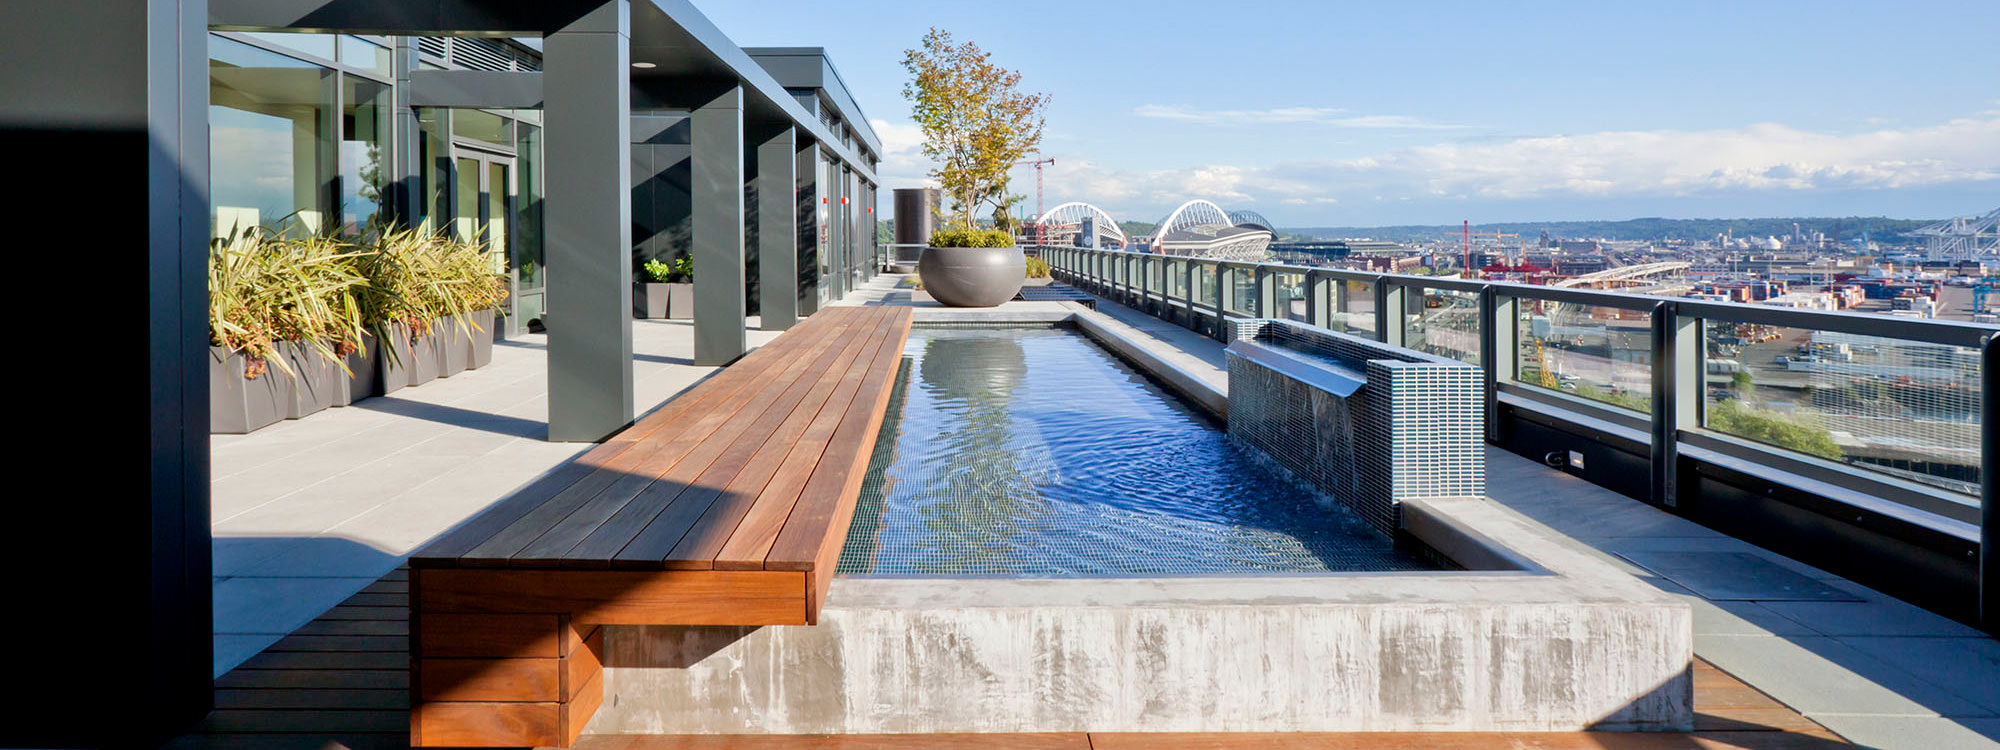 The Post Landscape Architecture